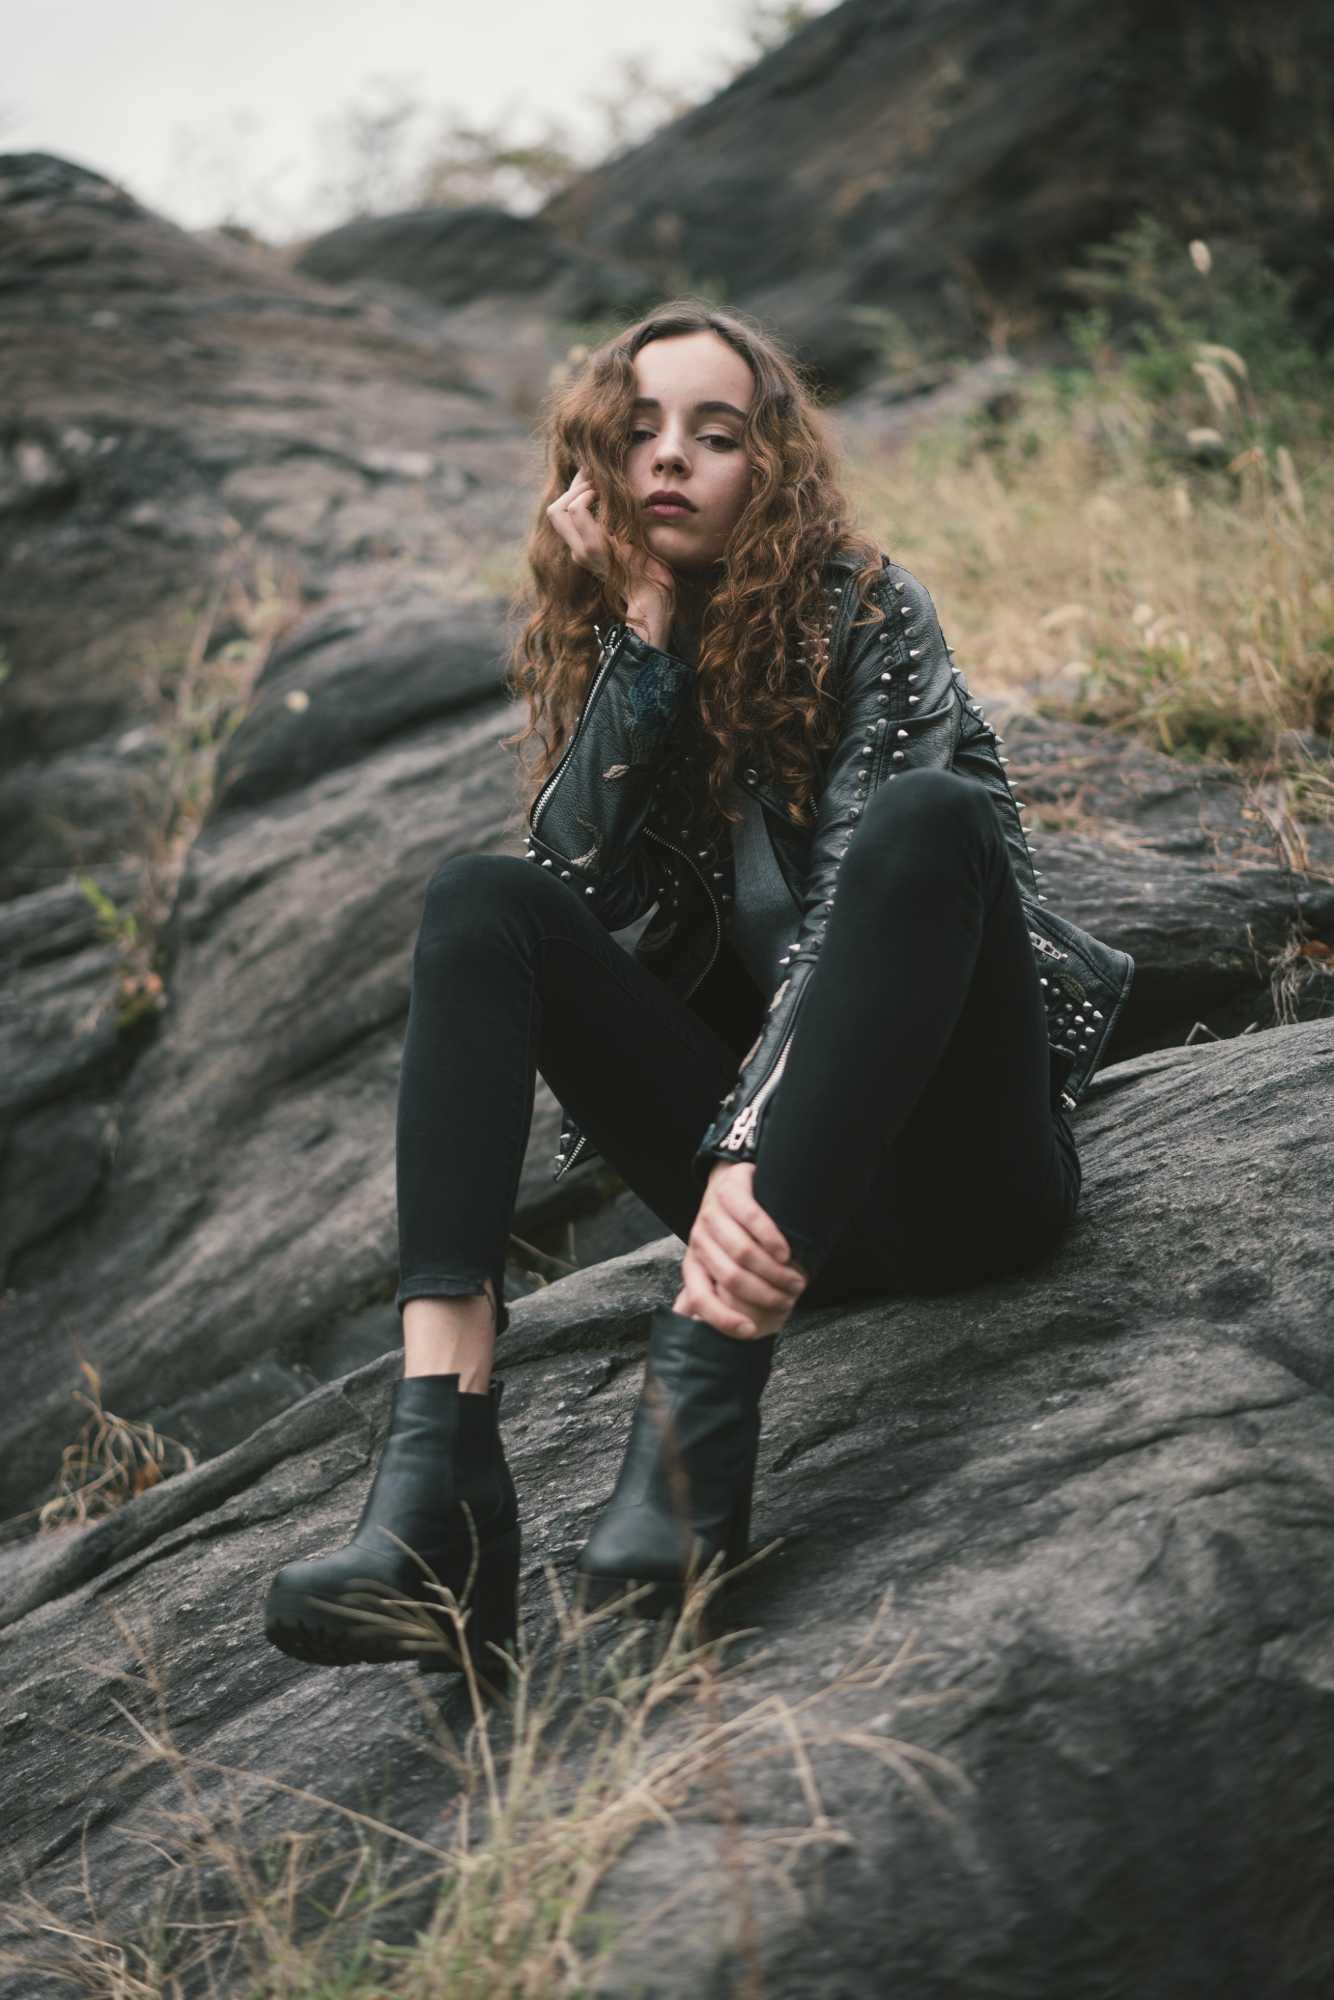 Model Natasha Klishina shot by photographer Zeno Gill